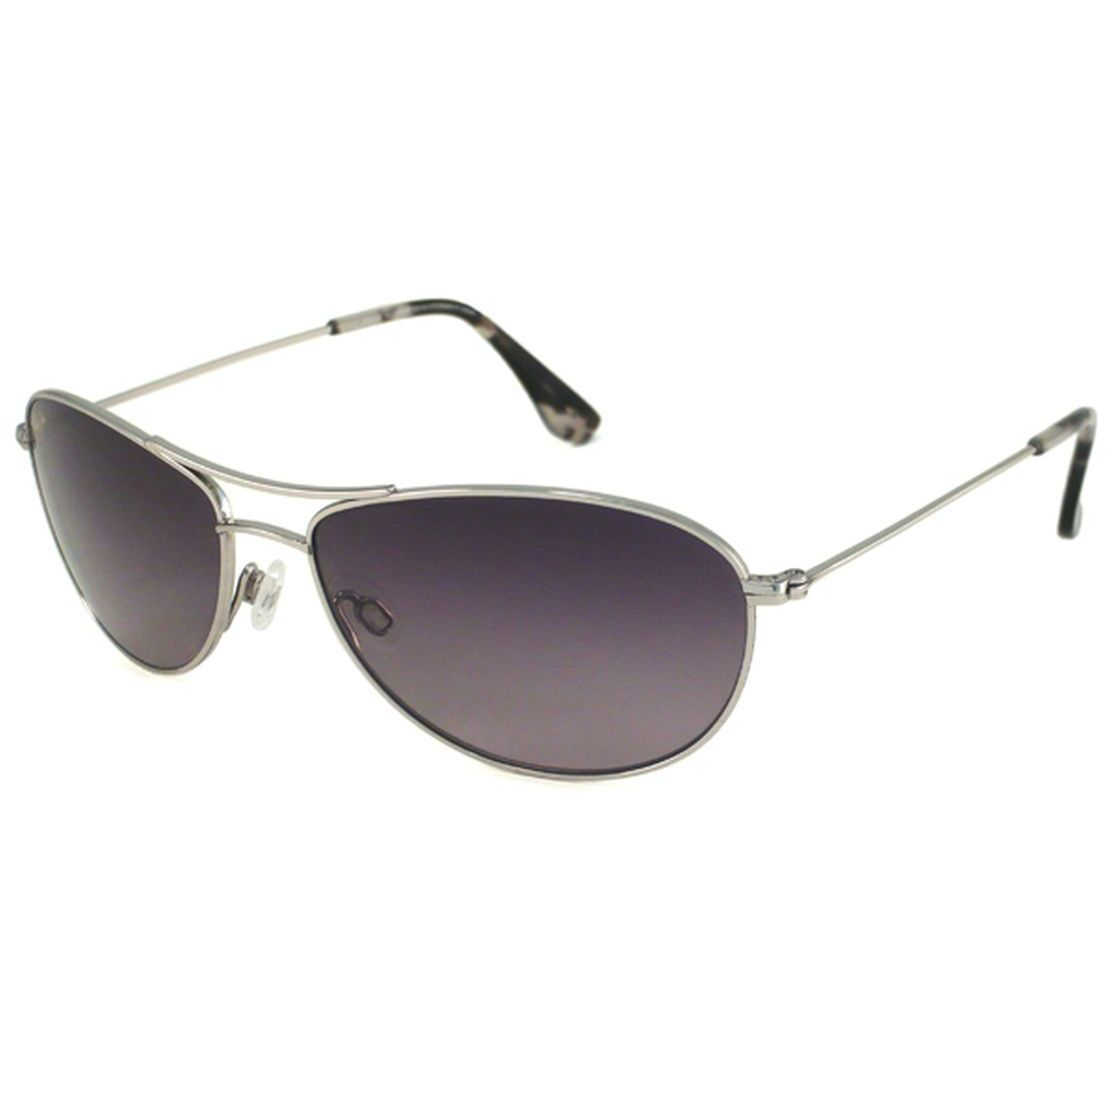 dafa14ec9a Maui Jim Unisex  Baby Beach  GS245 17 Silver Titanium Polarized Aviator  Sunglasses